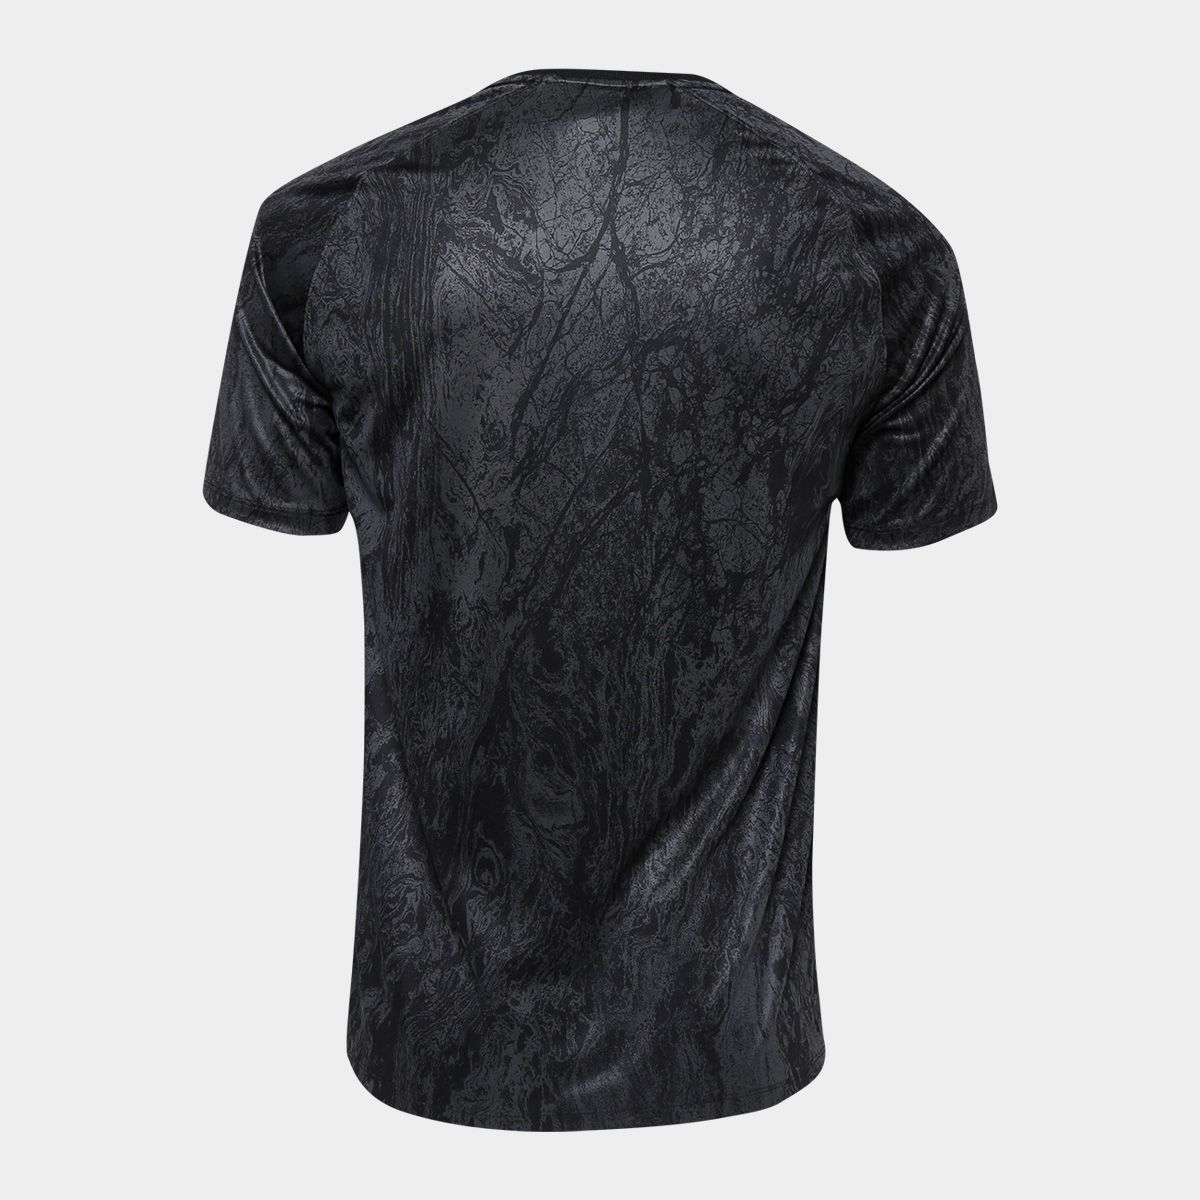 Camisa Corinthians II 2018/19 Replica